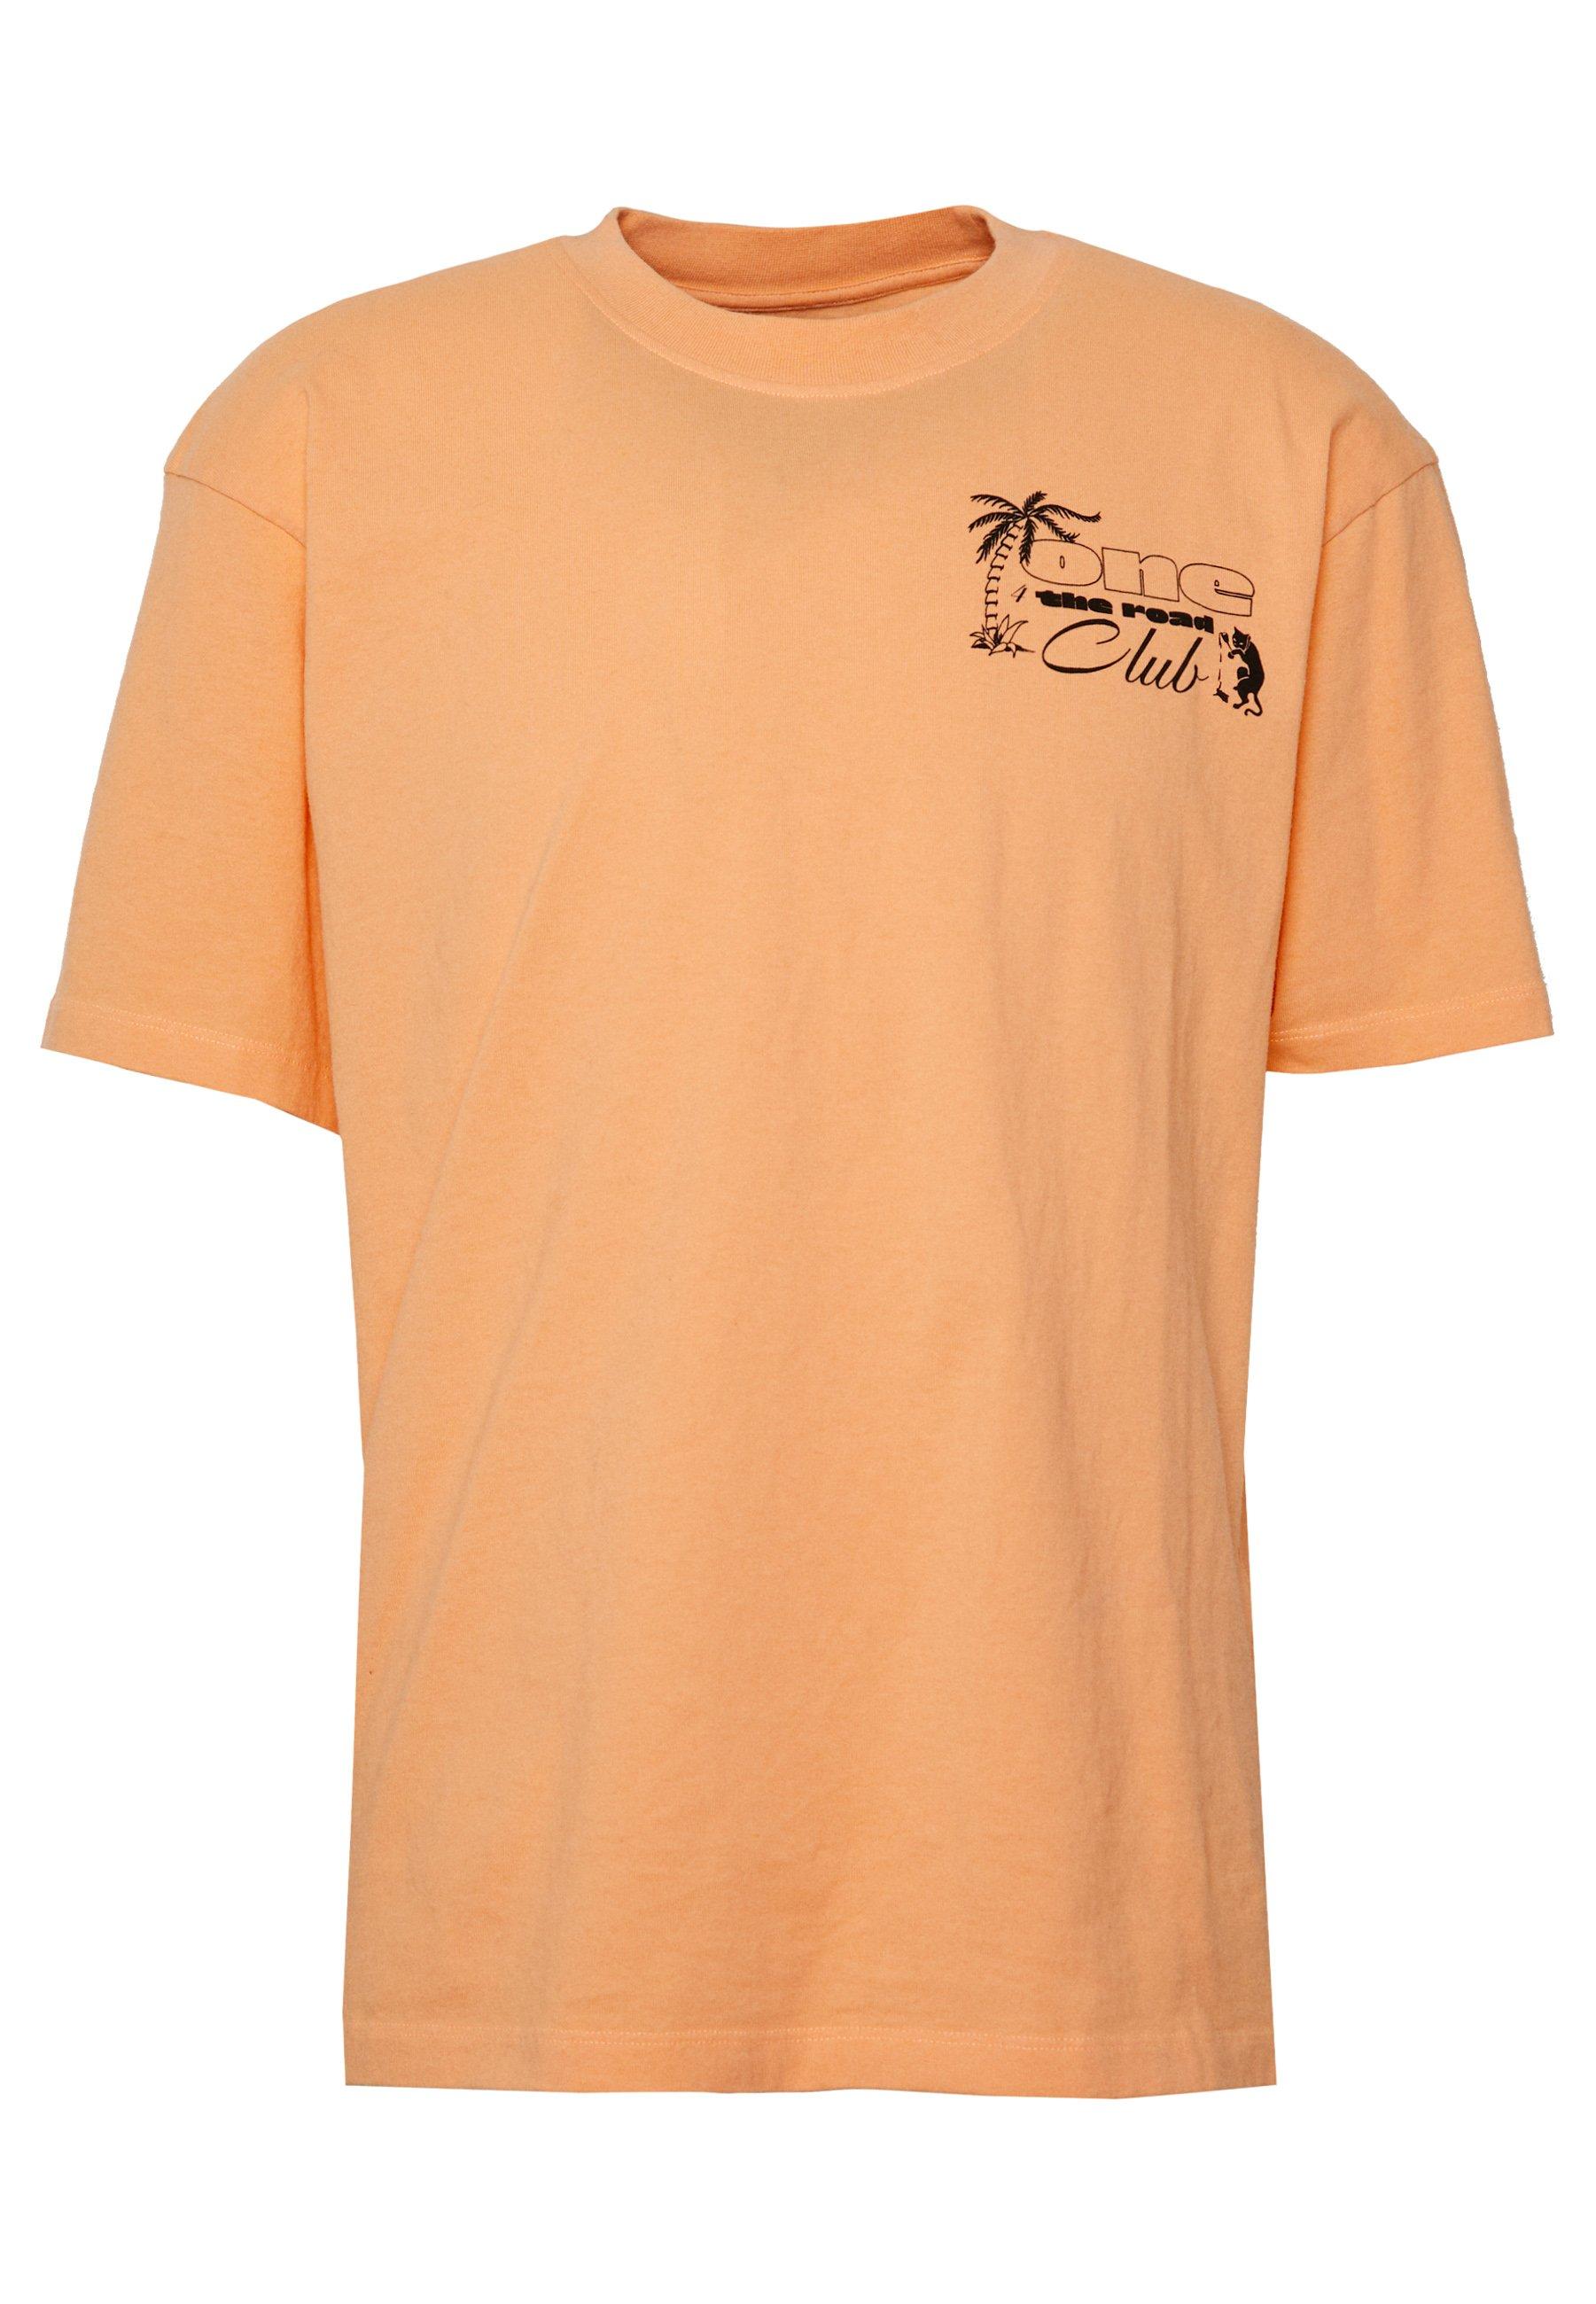 Edwin One The Road - T-shirt Imprimé Cantaloupe